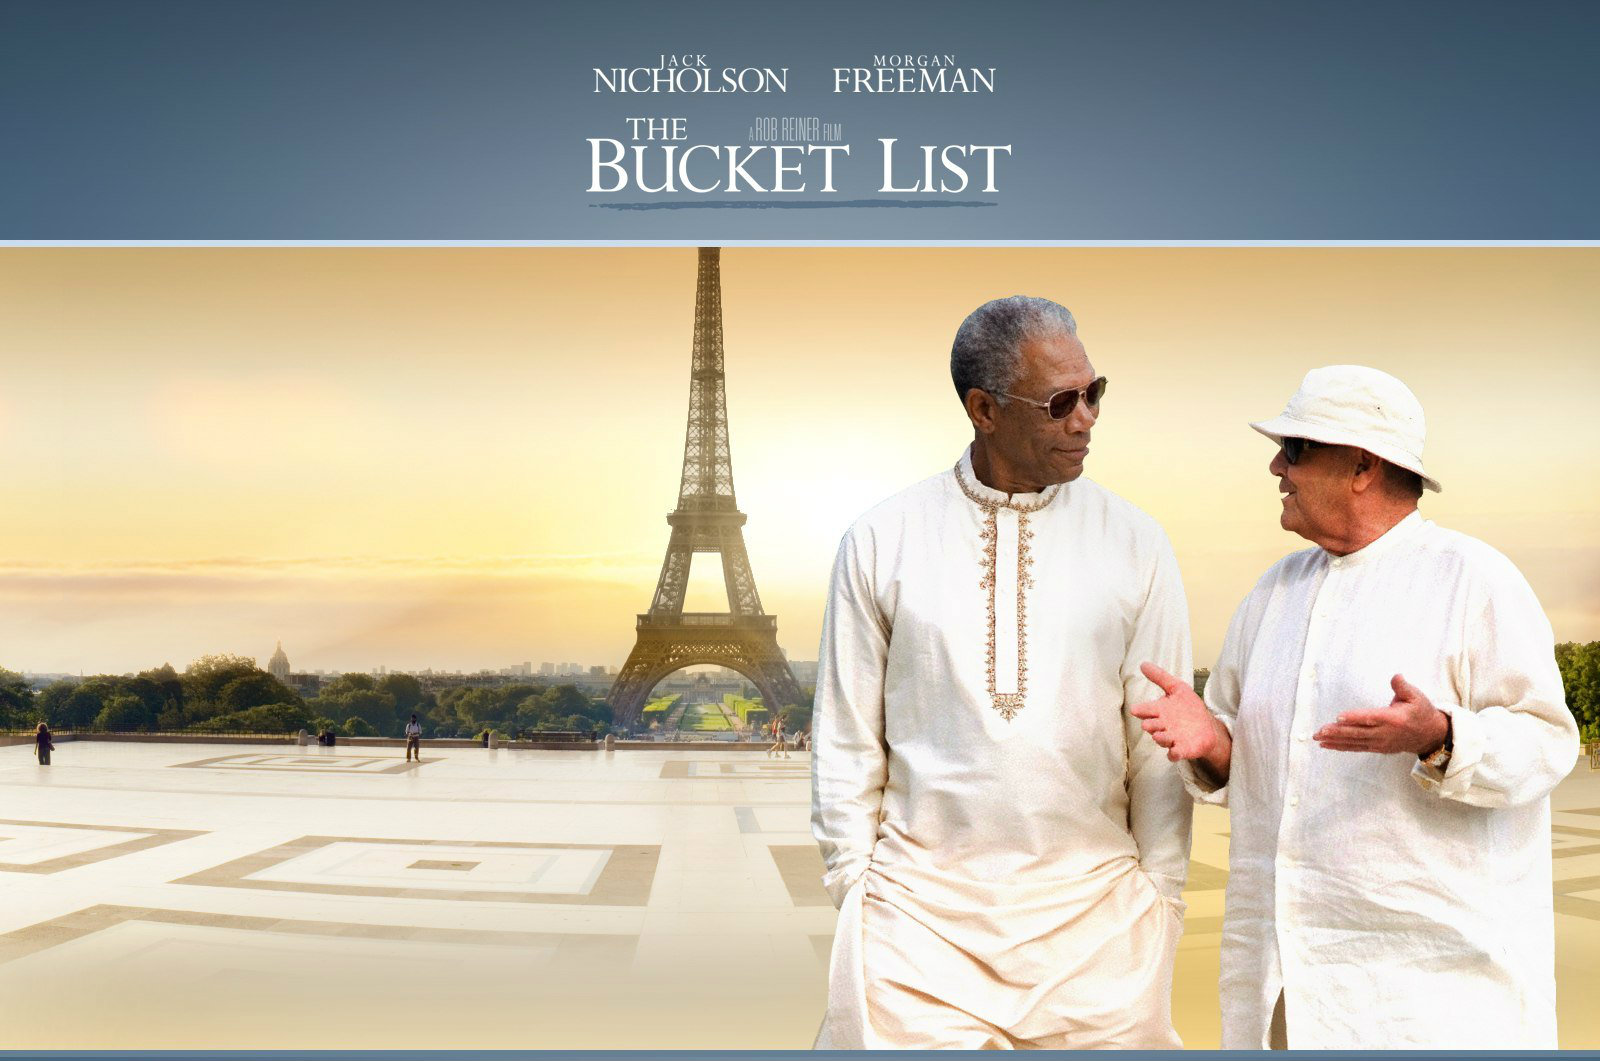 the_bucket_list01 11